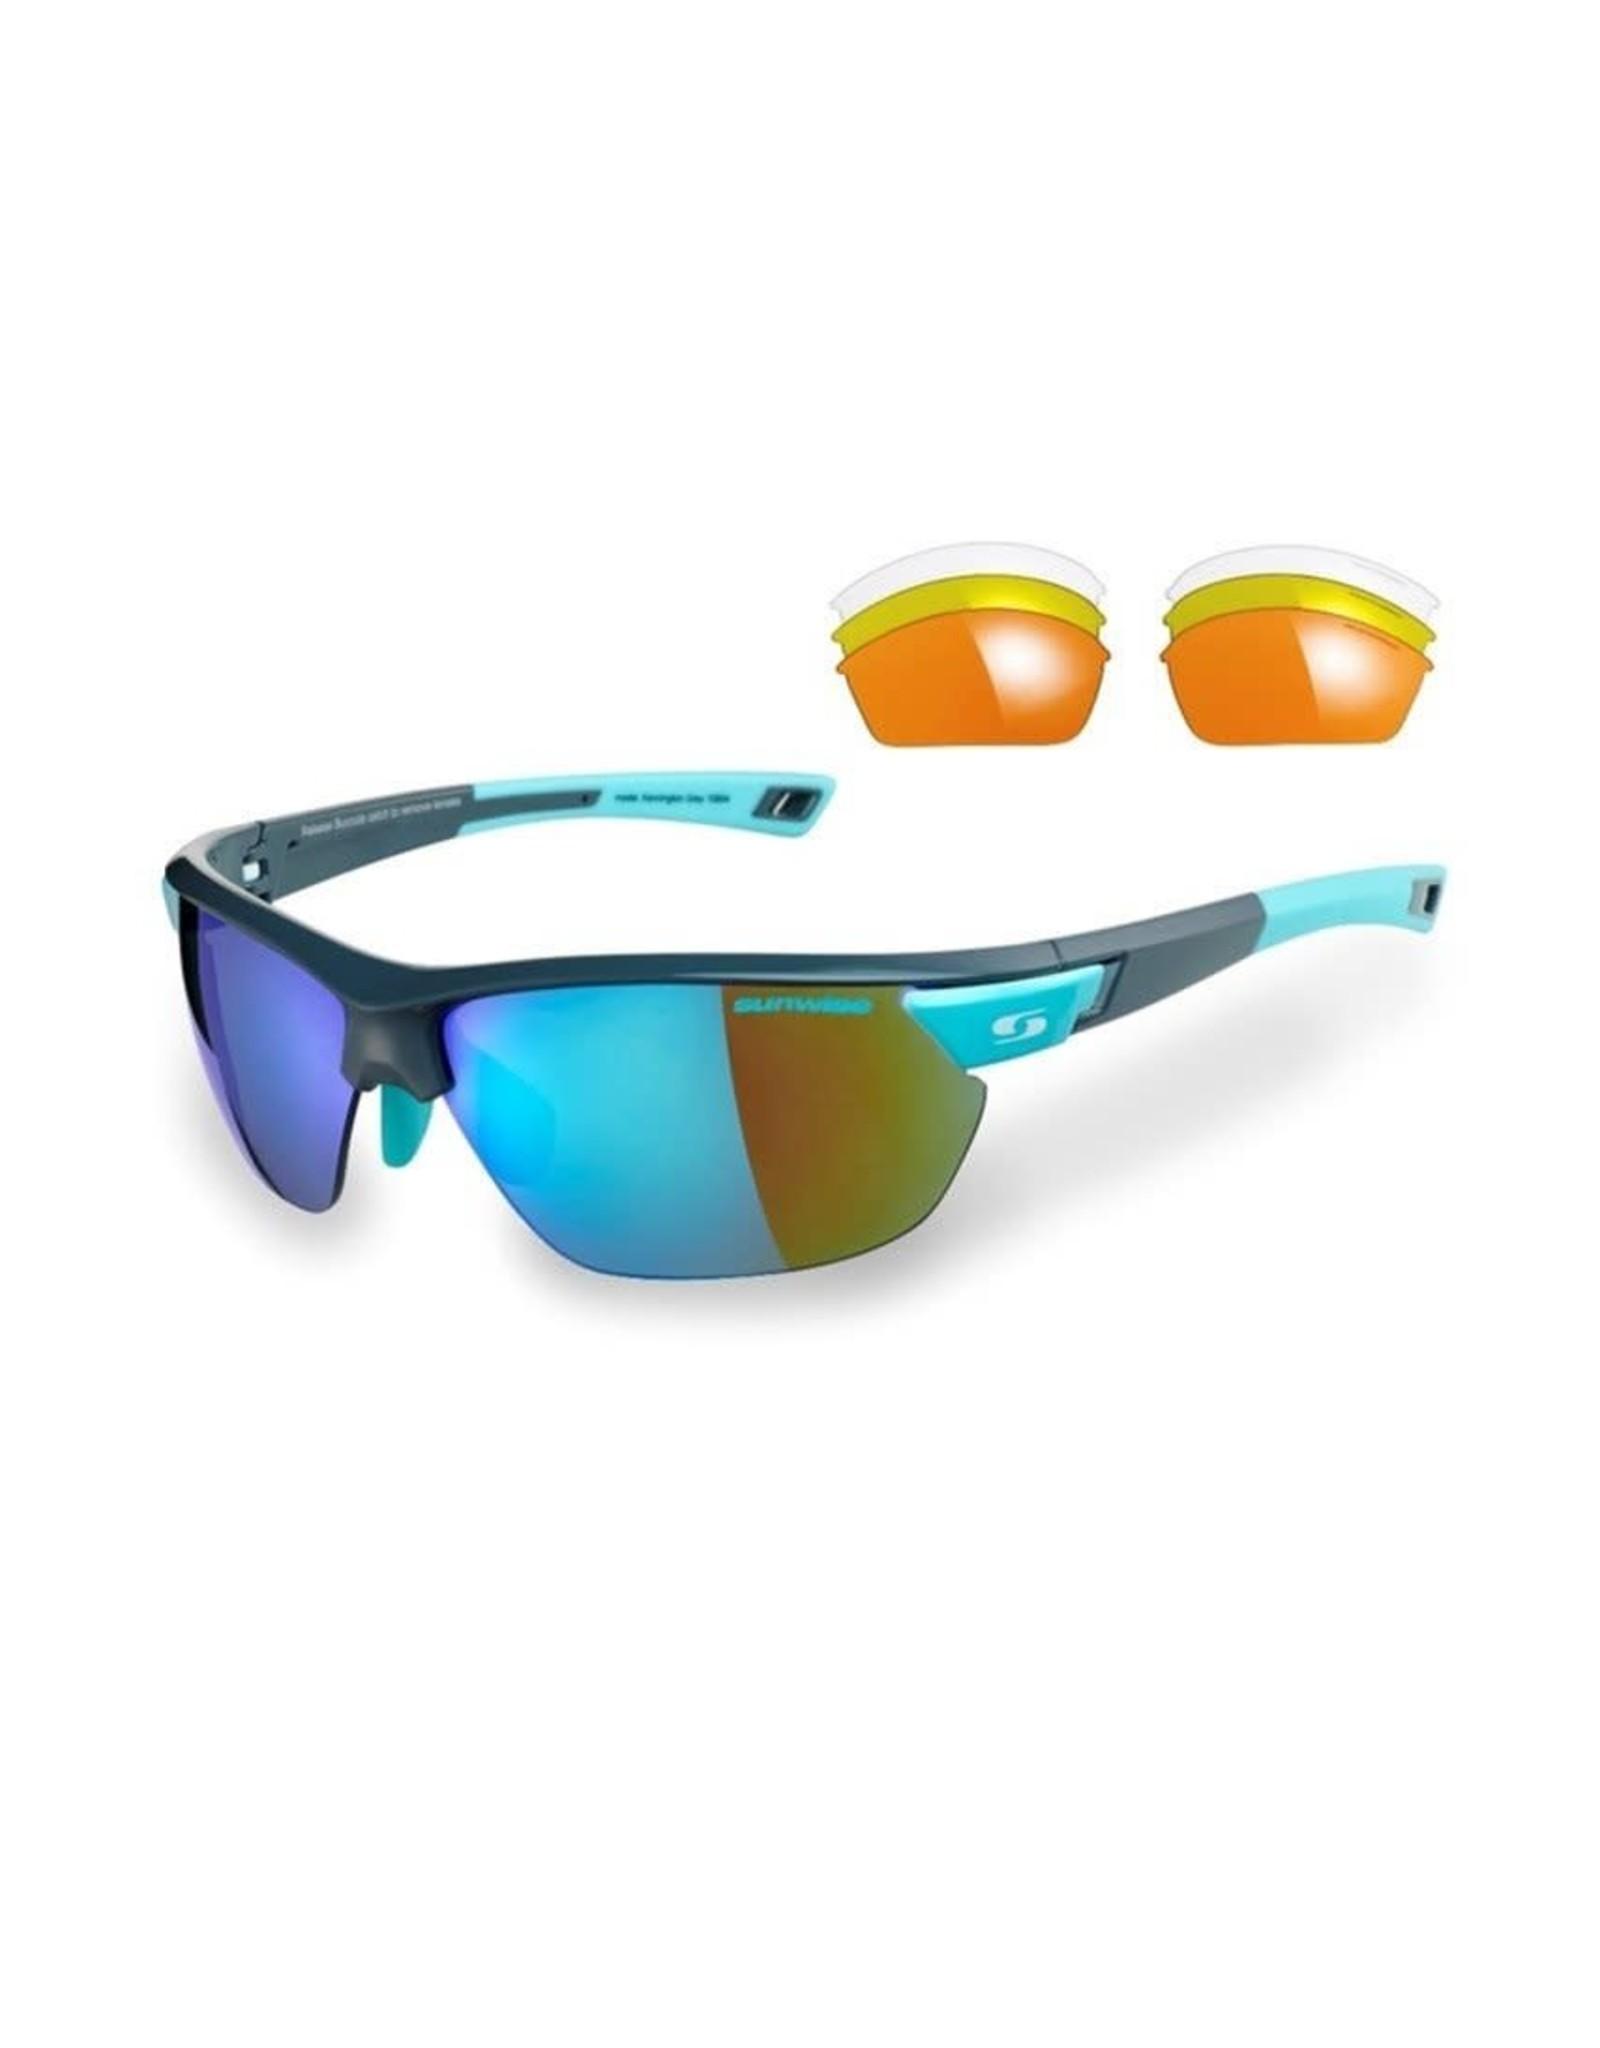 Sunwise Kennington Sunglasses Grey/Blue